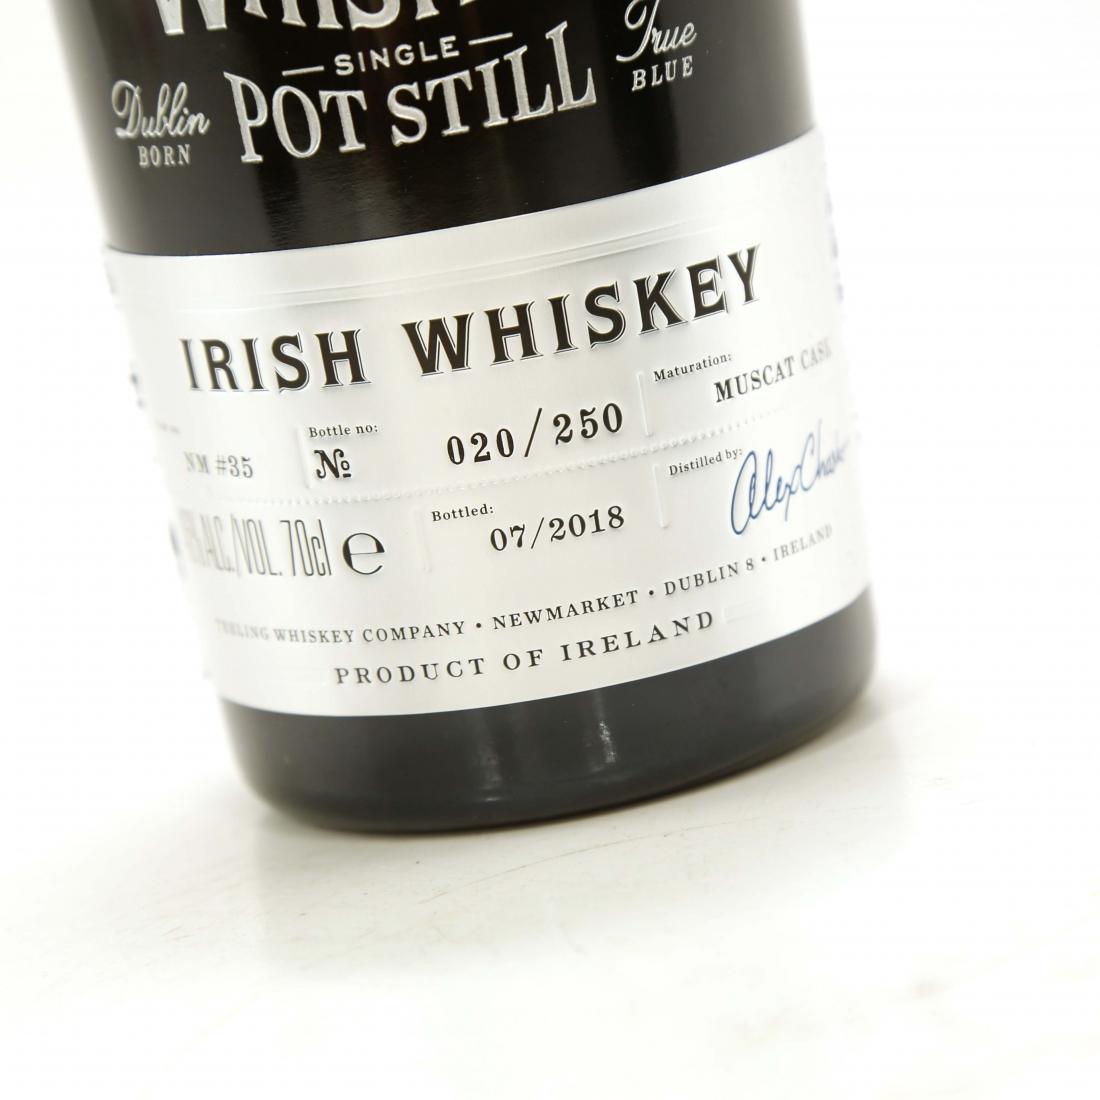 Teeling Celebratory Single Pot Still Whiskey / Bottle #020